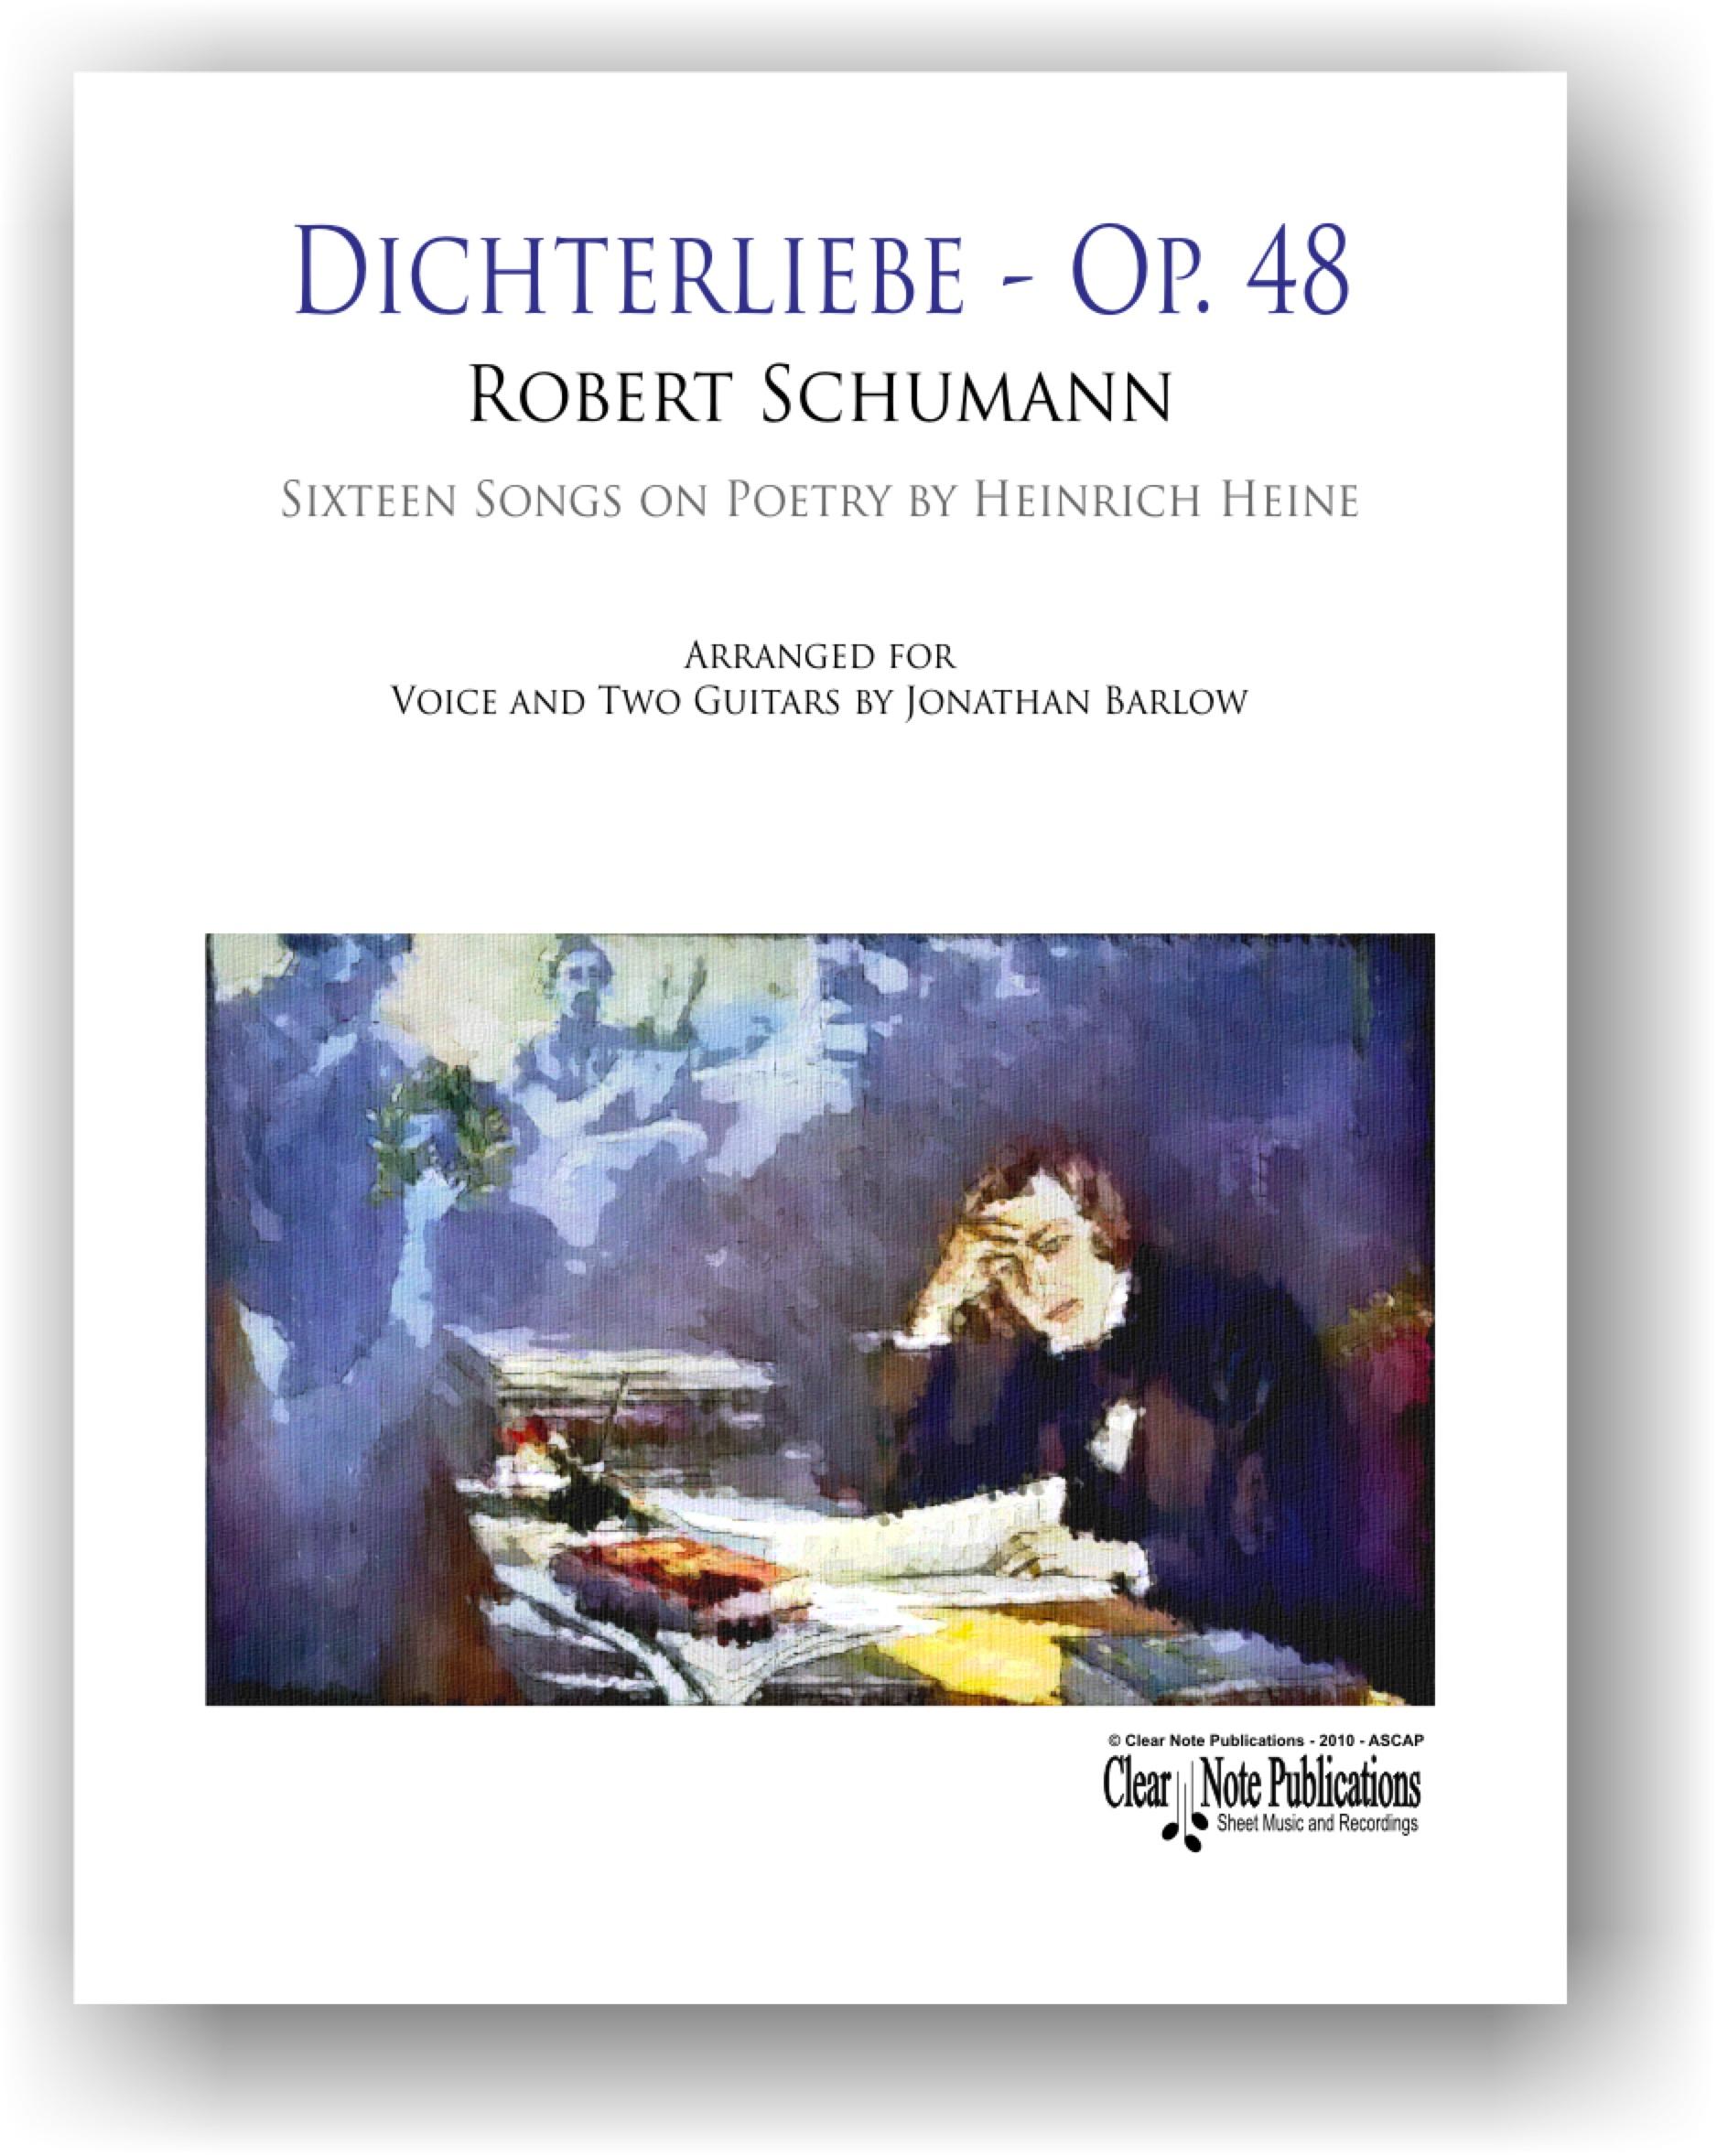 Dichterliebe, Op. 48